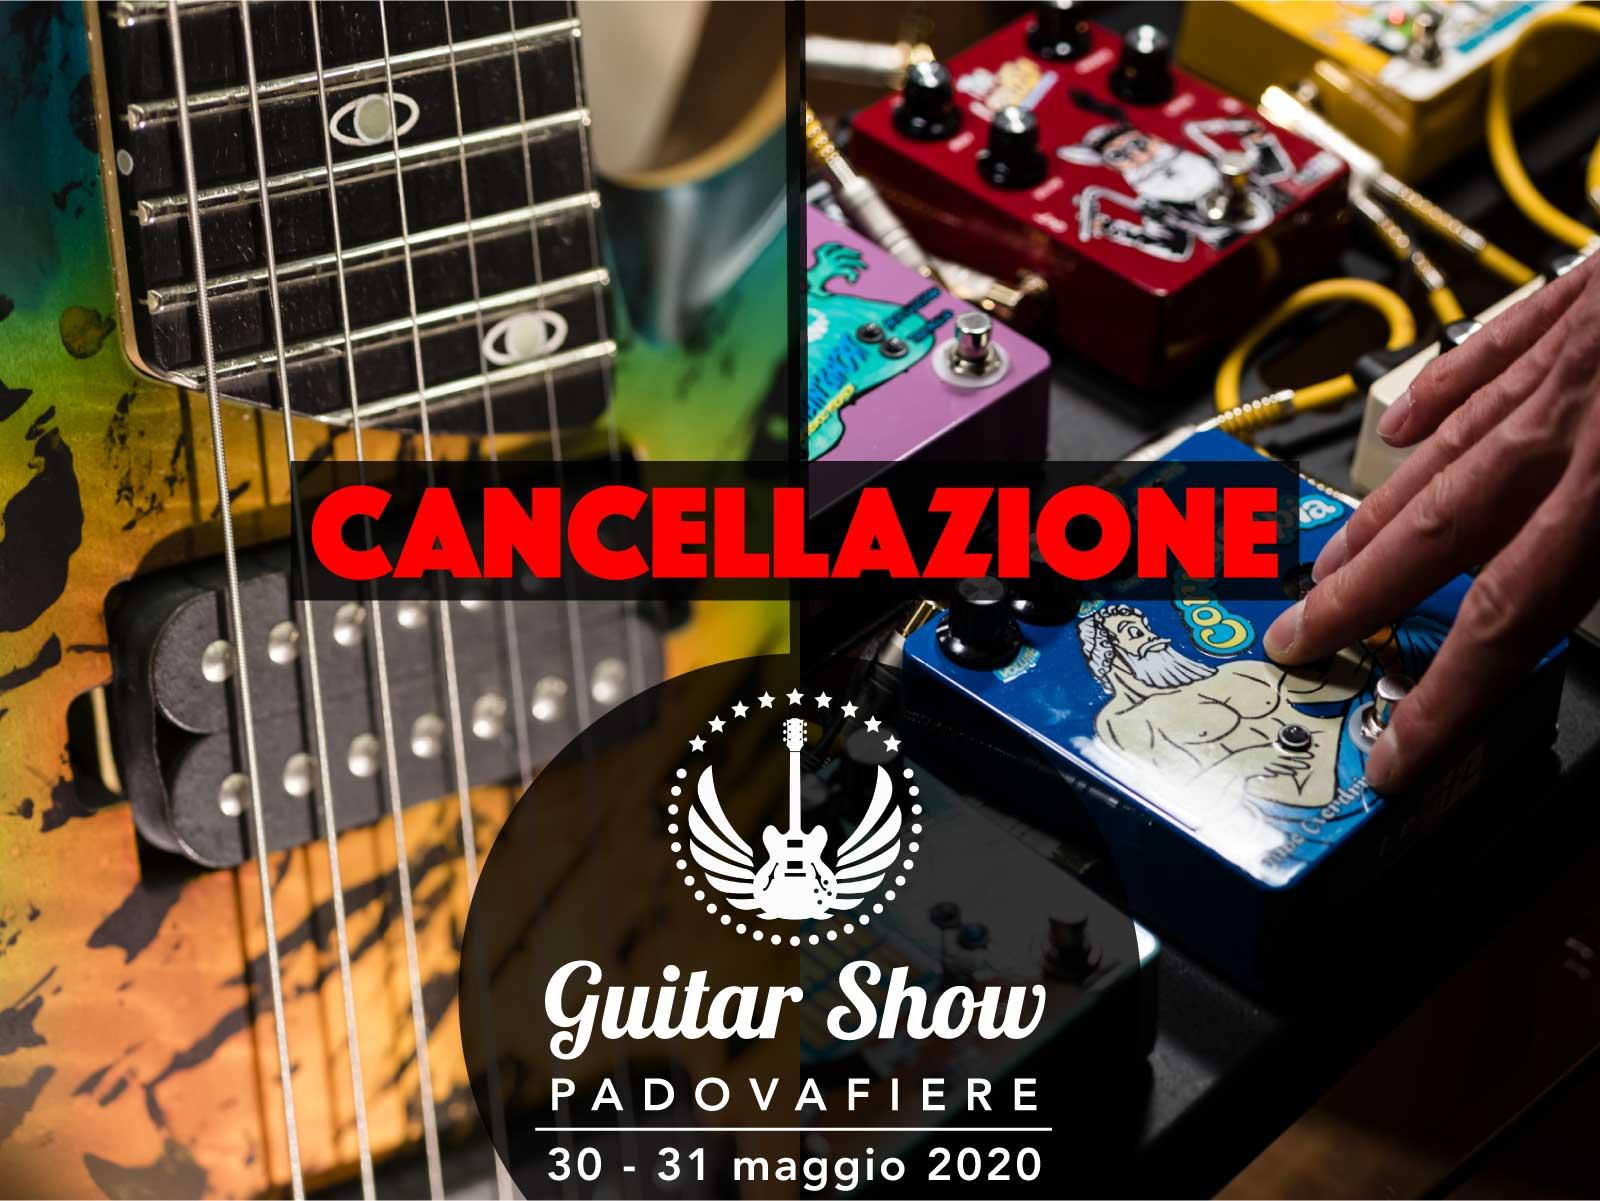 Guitar Show – arrivederci al 2021